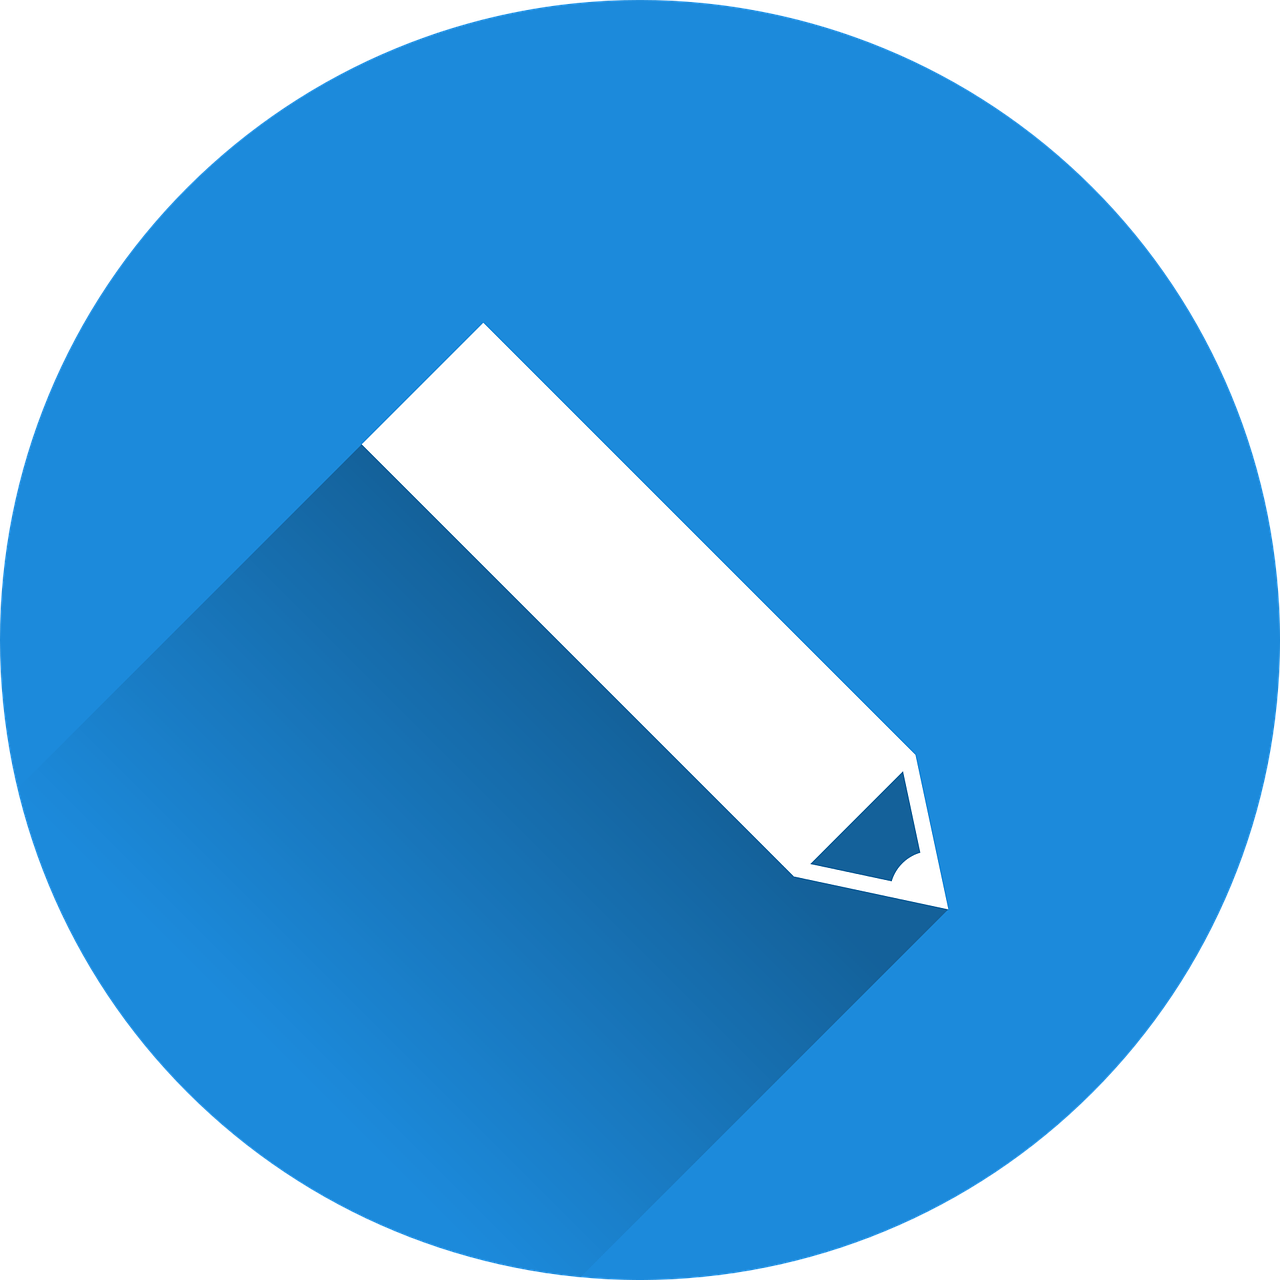 pen, write, pencil